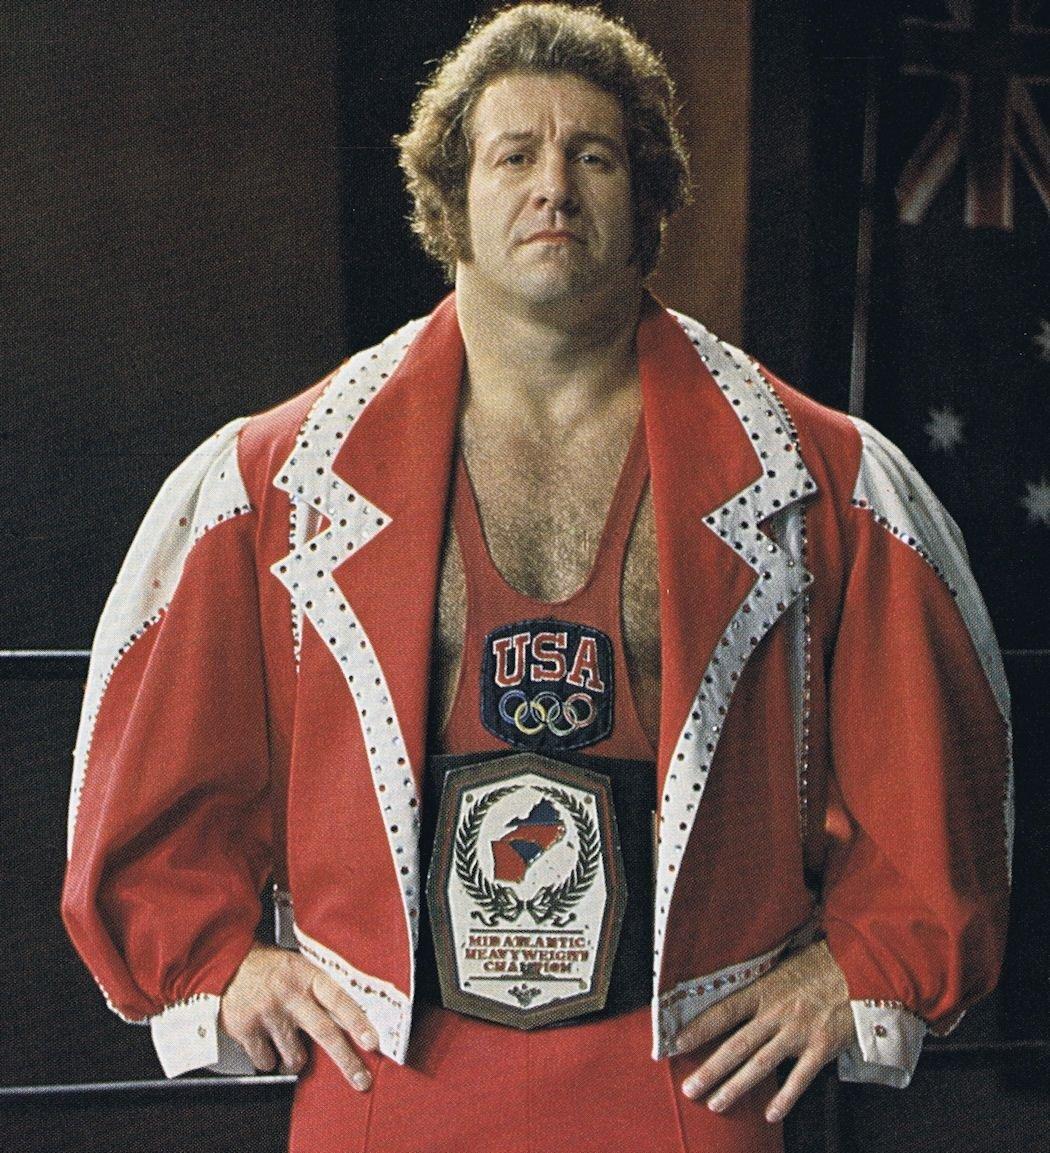 Ken Patera was pro wrestling's Olympic hero, world's strongest man